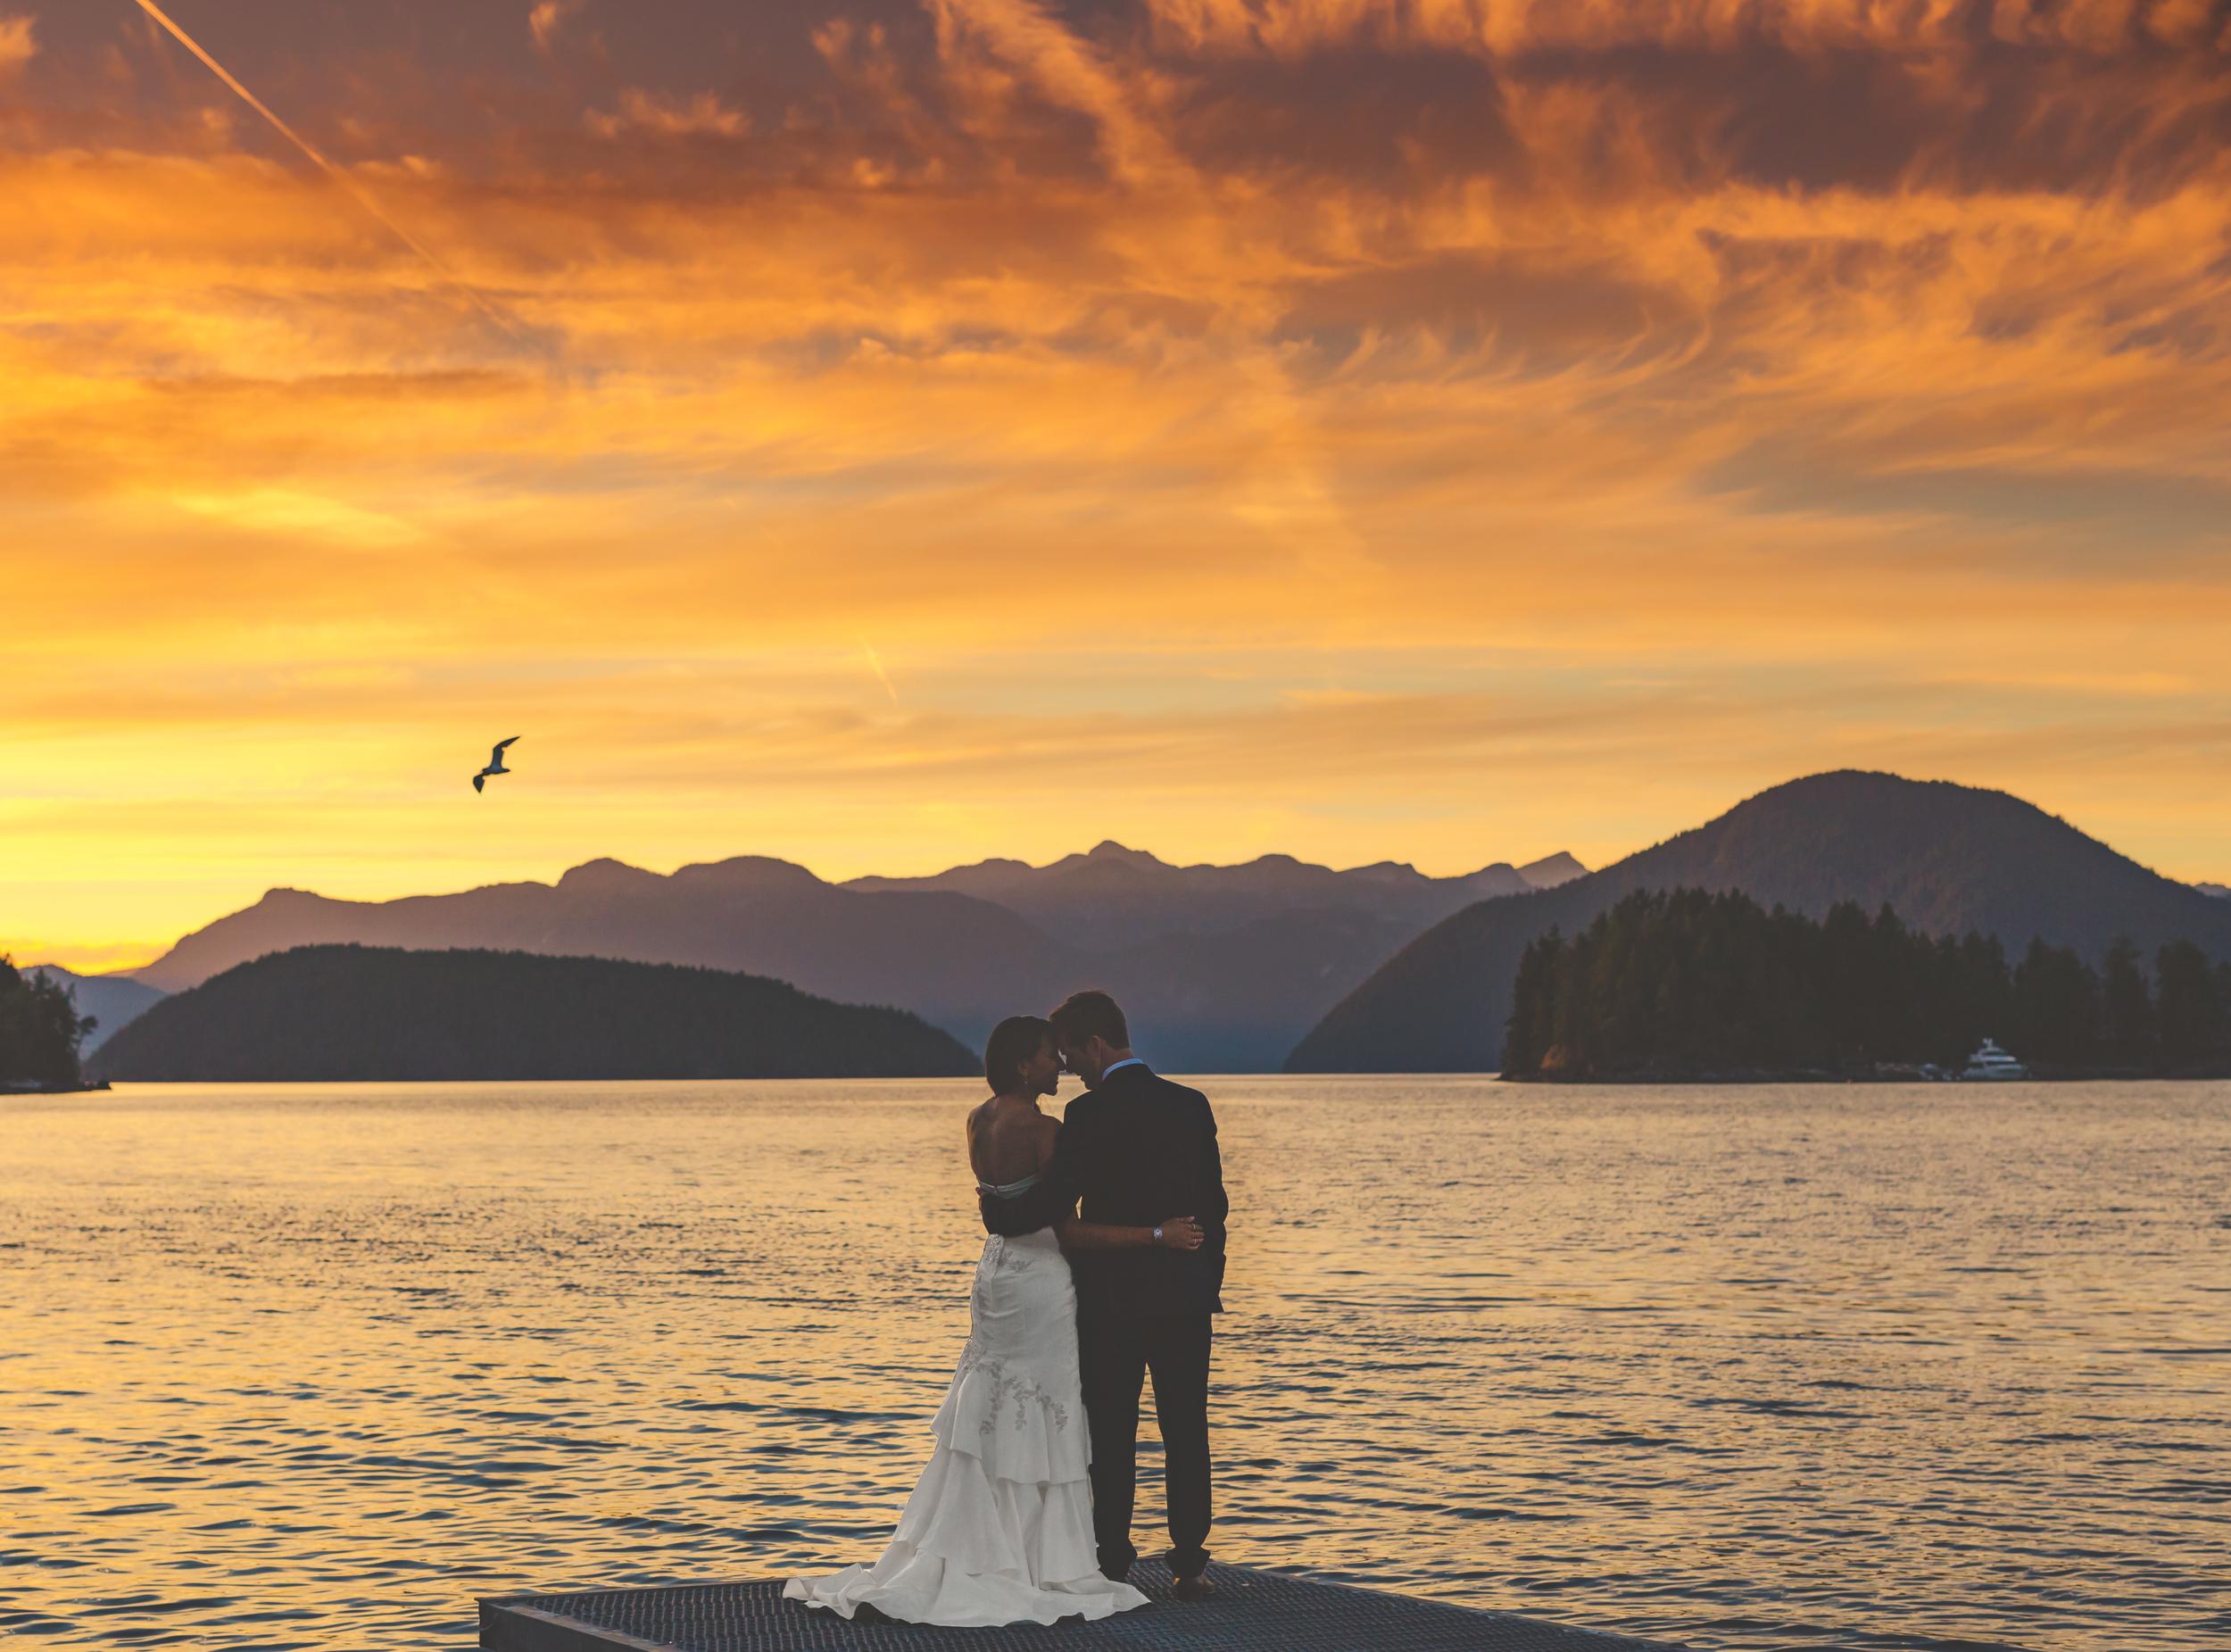 west coast wilderness lodge wedding, sunshine coast wedding photographer, vancouver wedding photographer, sunset wedding, jennifer picard photography